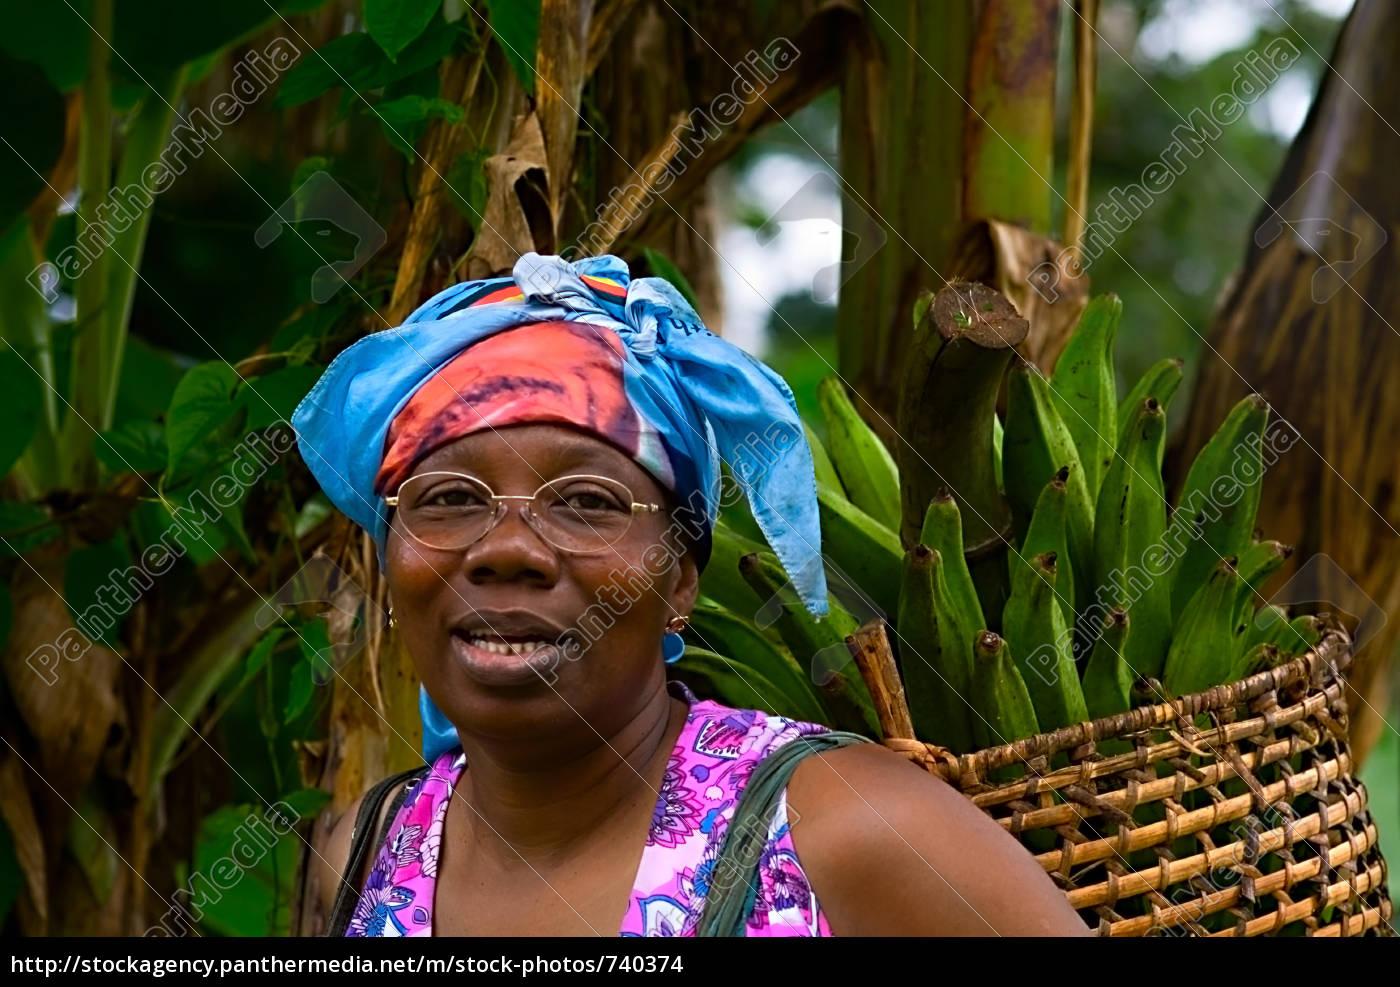 madame, eloundou, wearing, banana, home - 740374